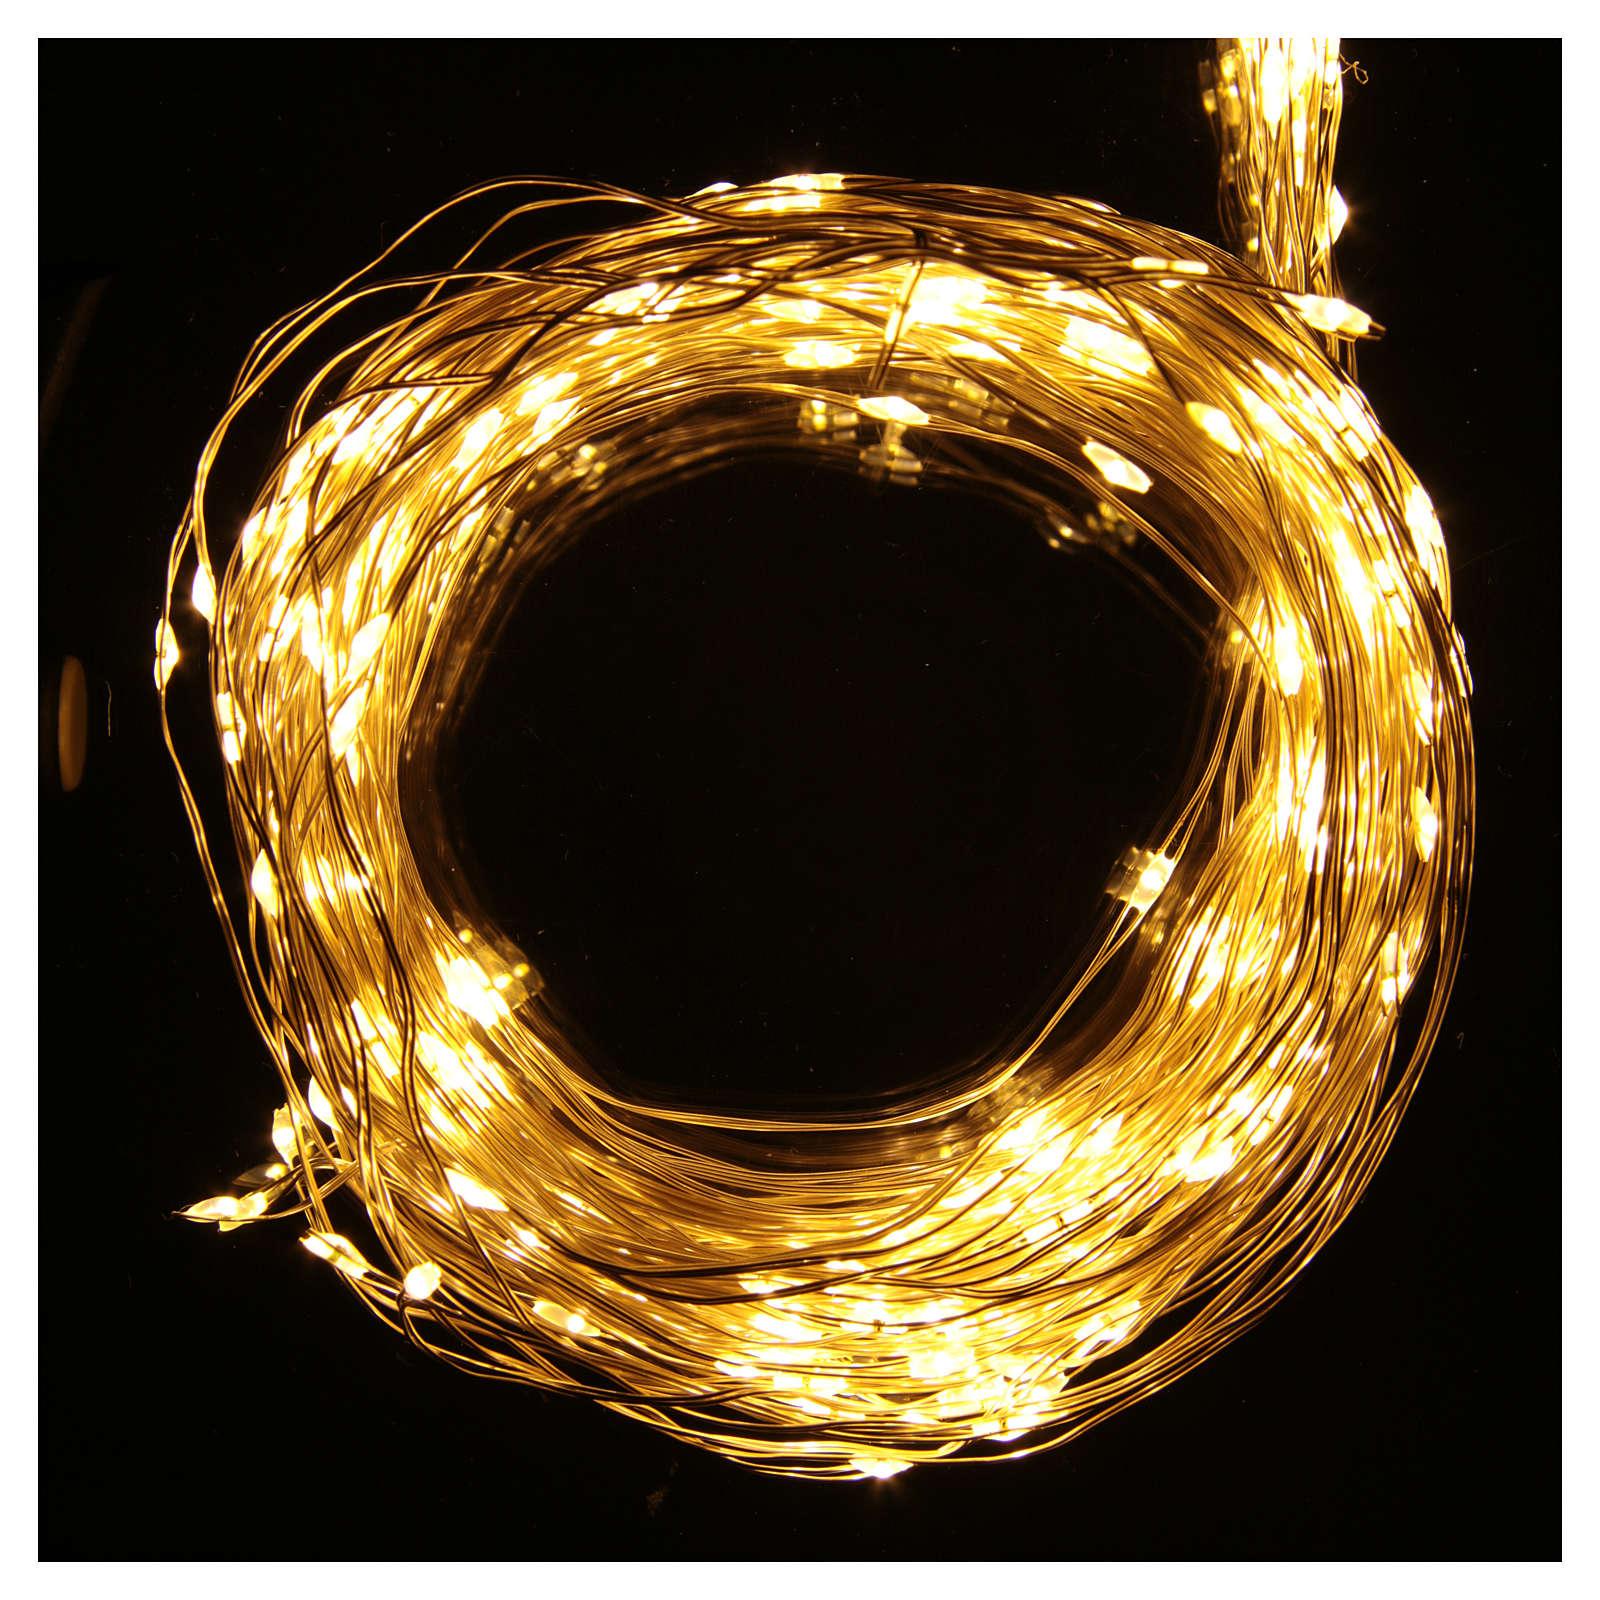 Luce di Natale rami 360 microled bianco caldo interno 3